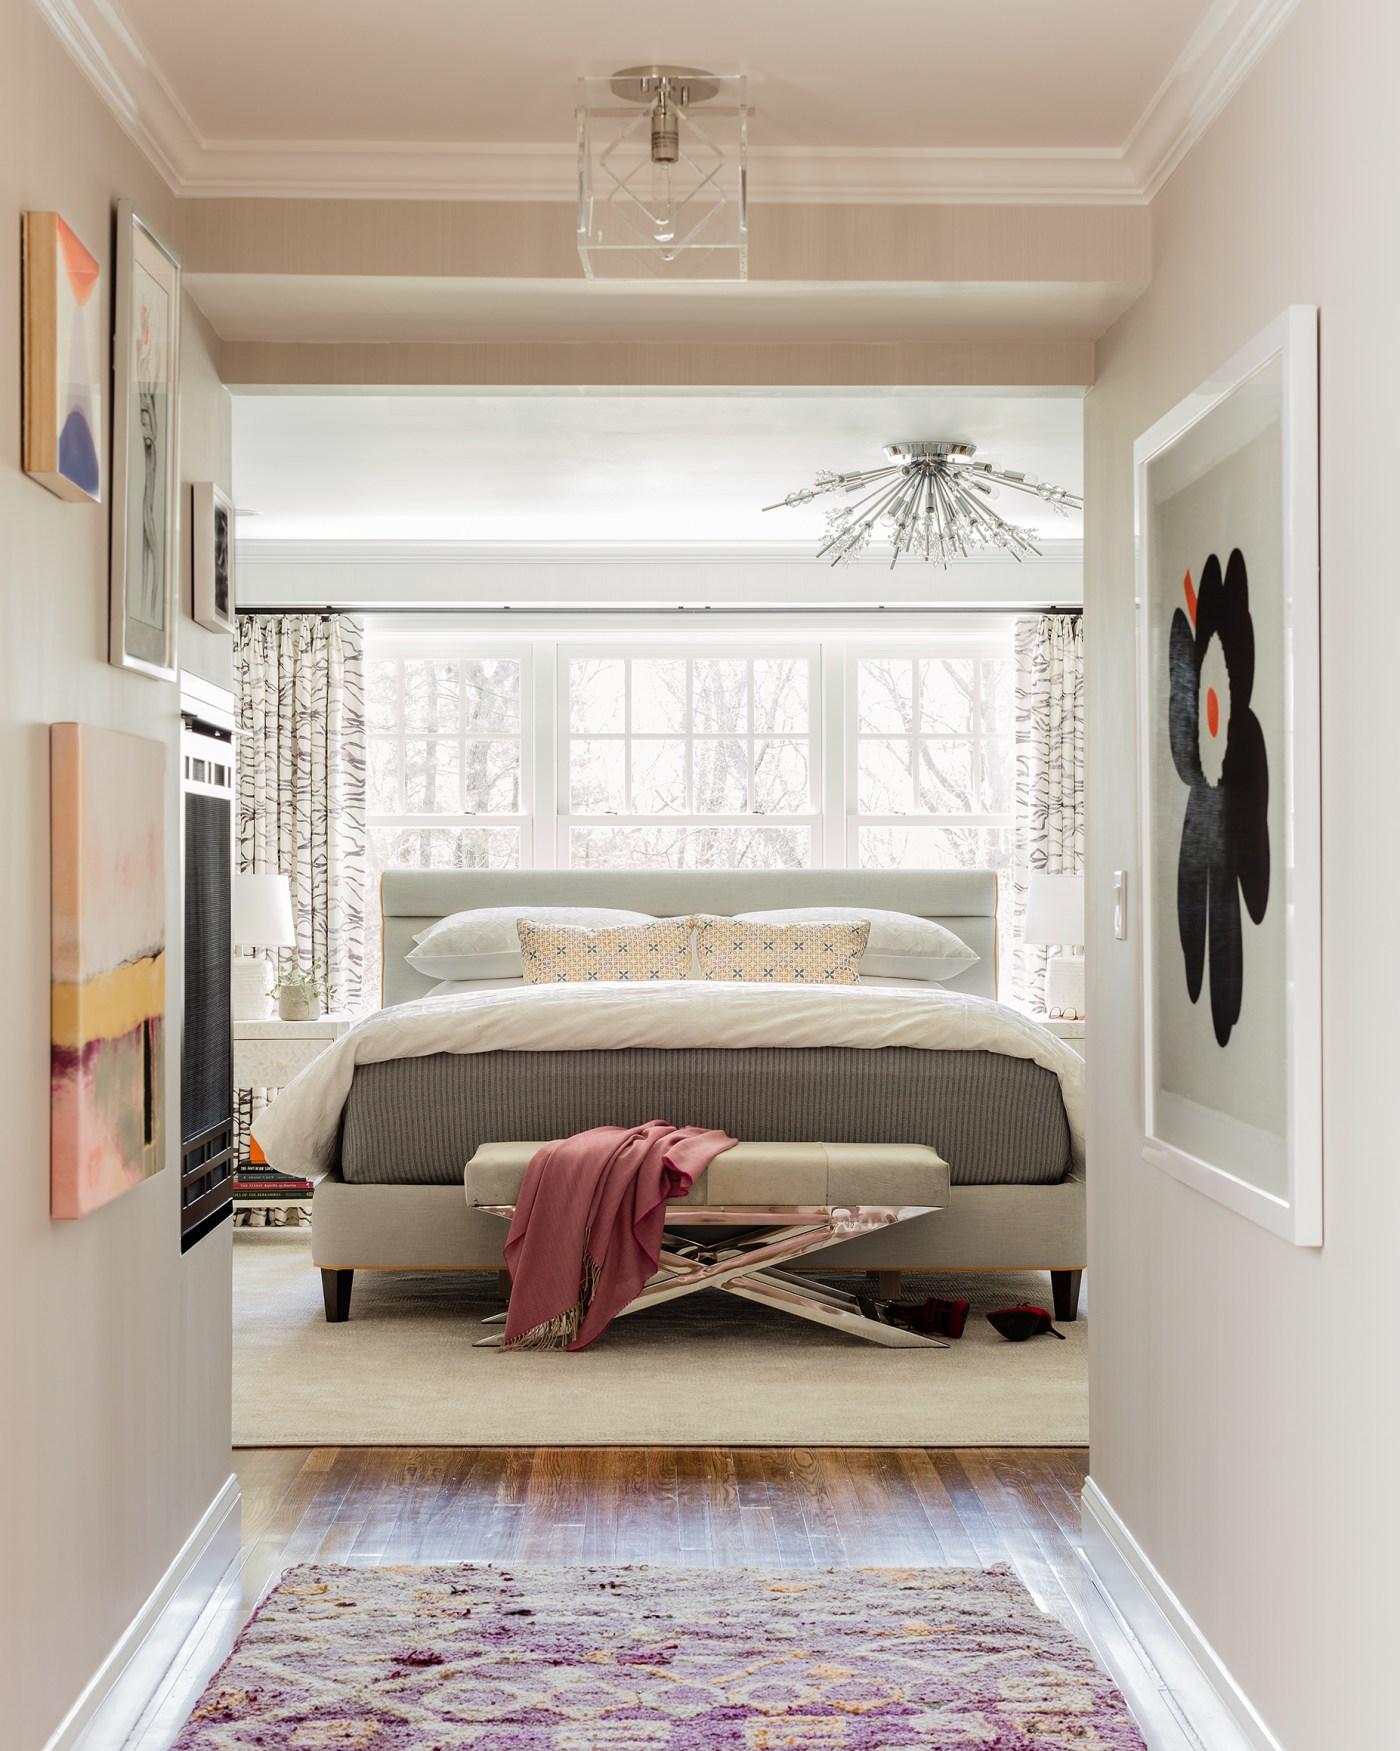 interiorsforfamiliesbedroom